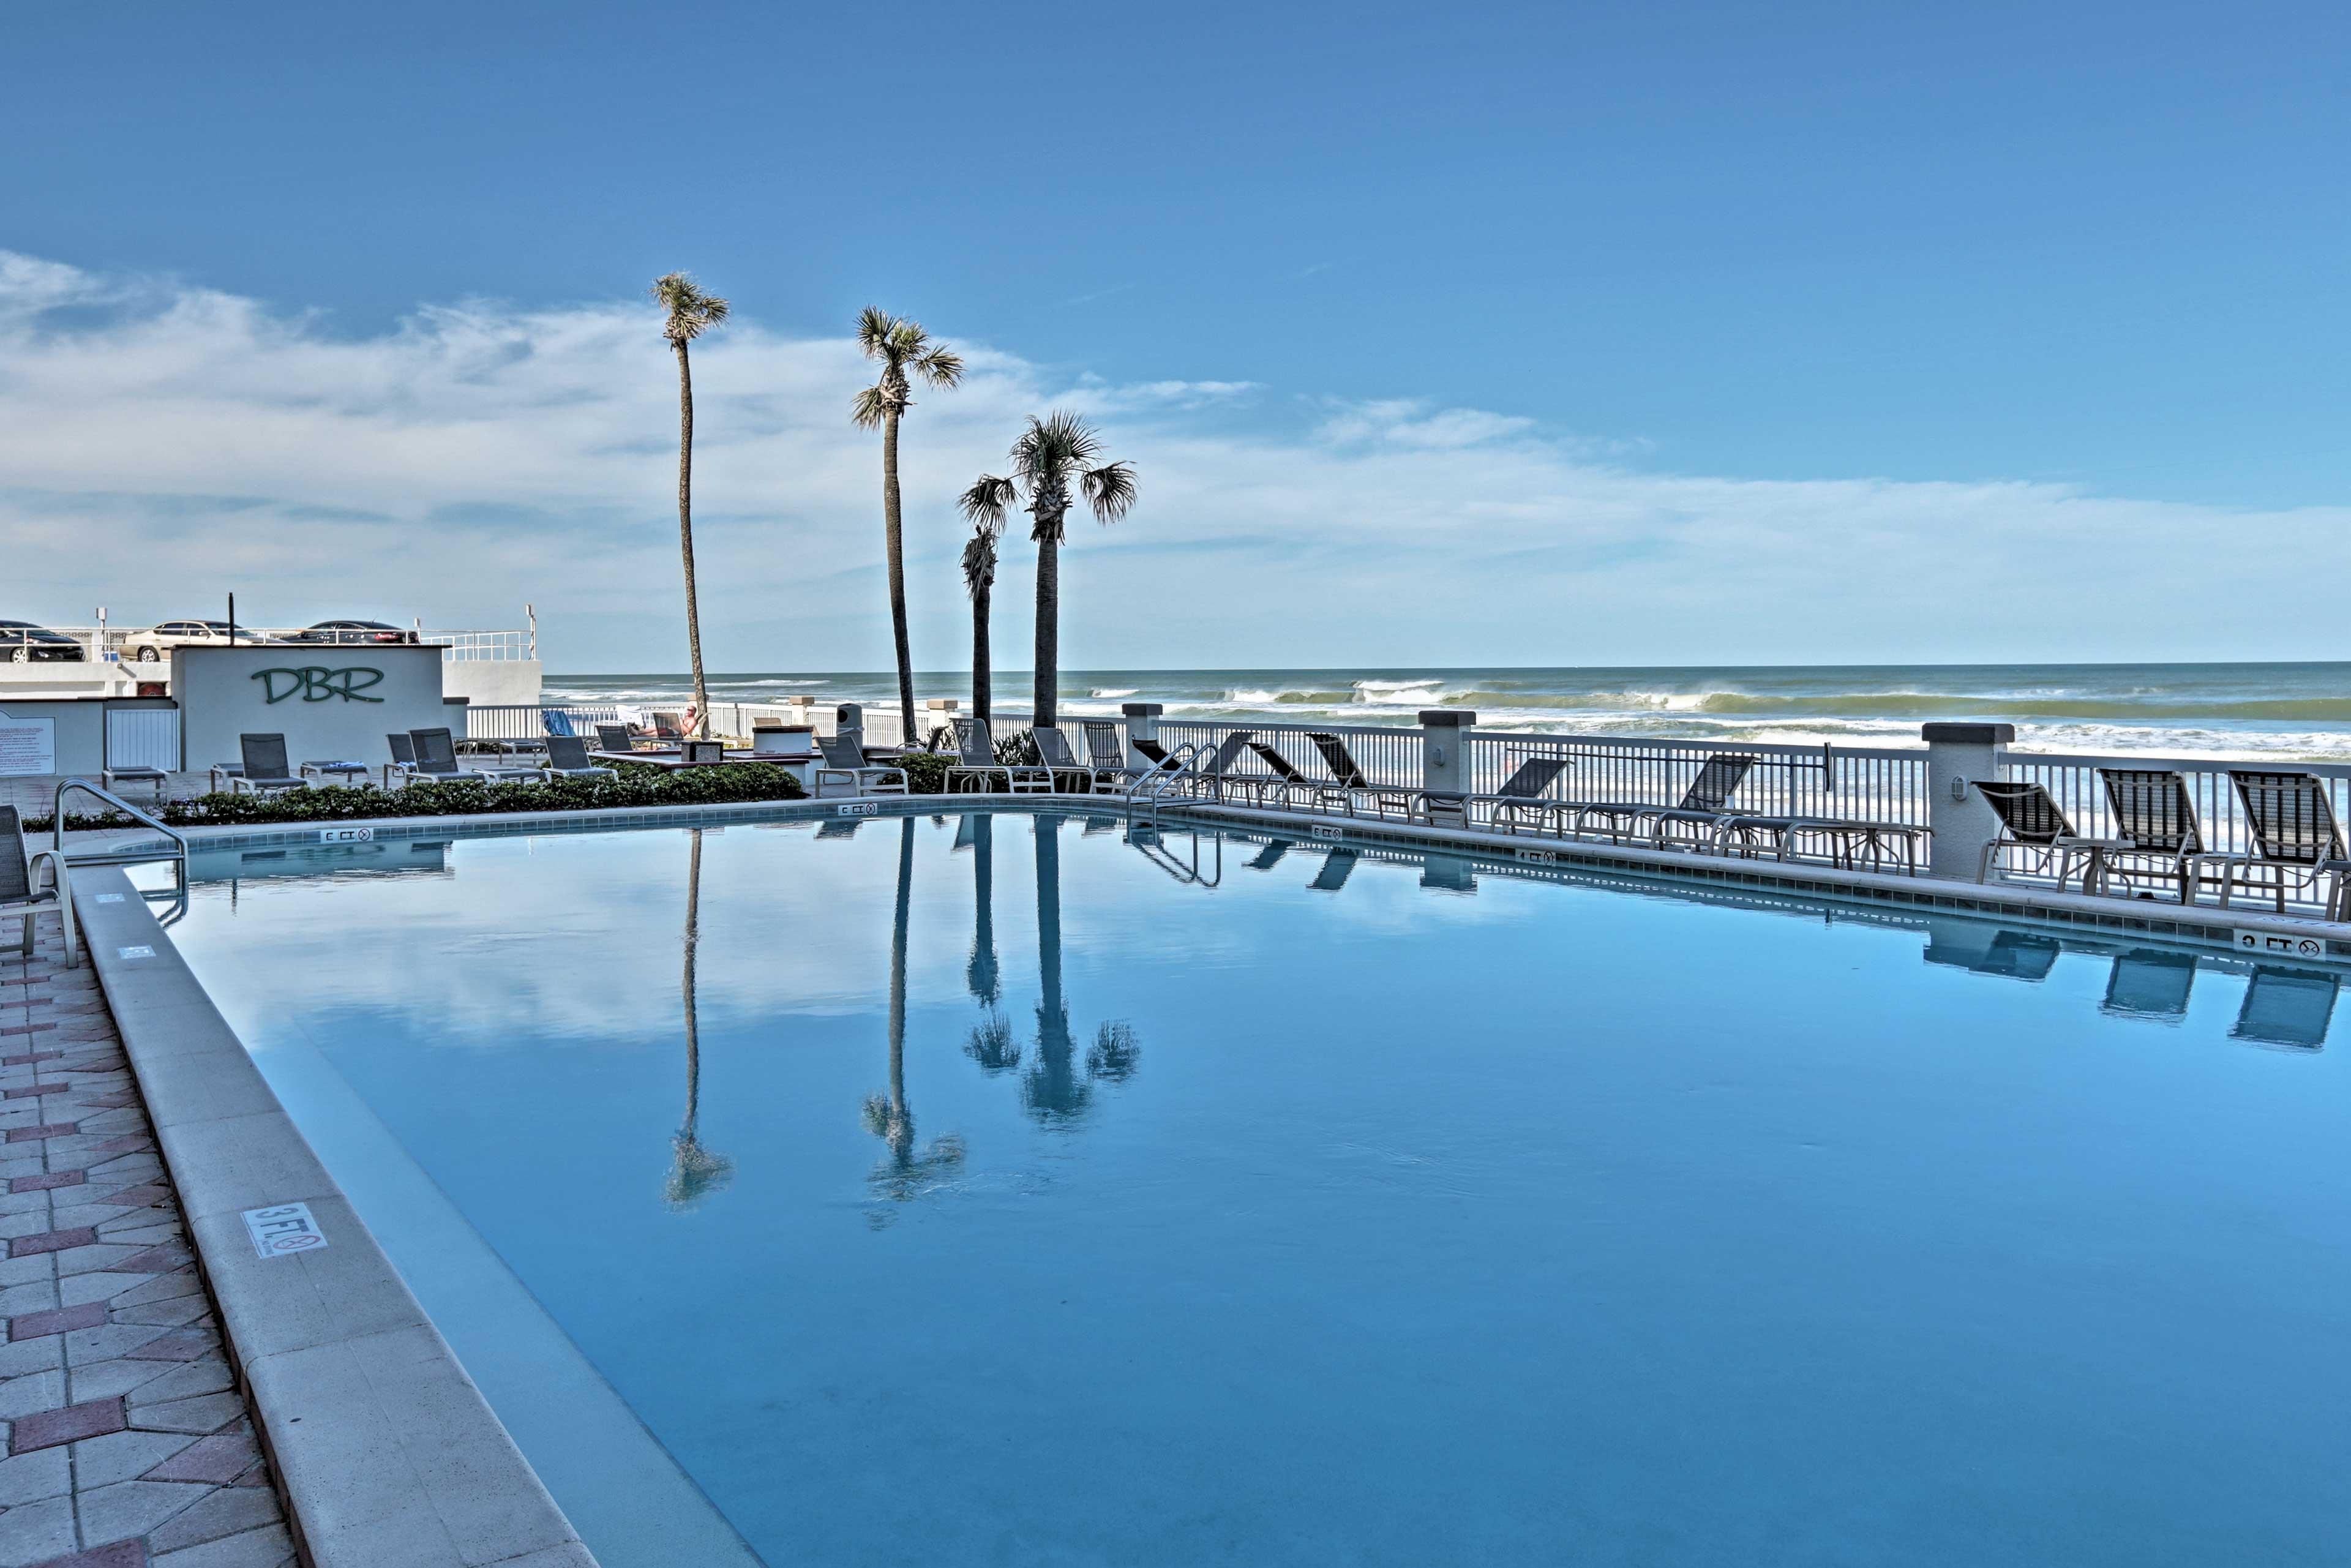 Book your Daytona Beach getaway at this 1-bedroom, 1-bath vacation rental condo.